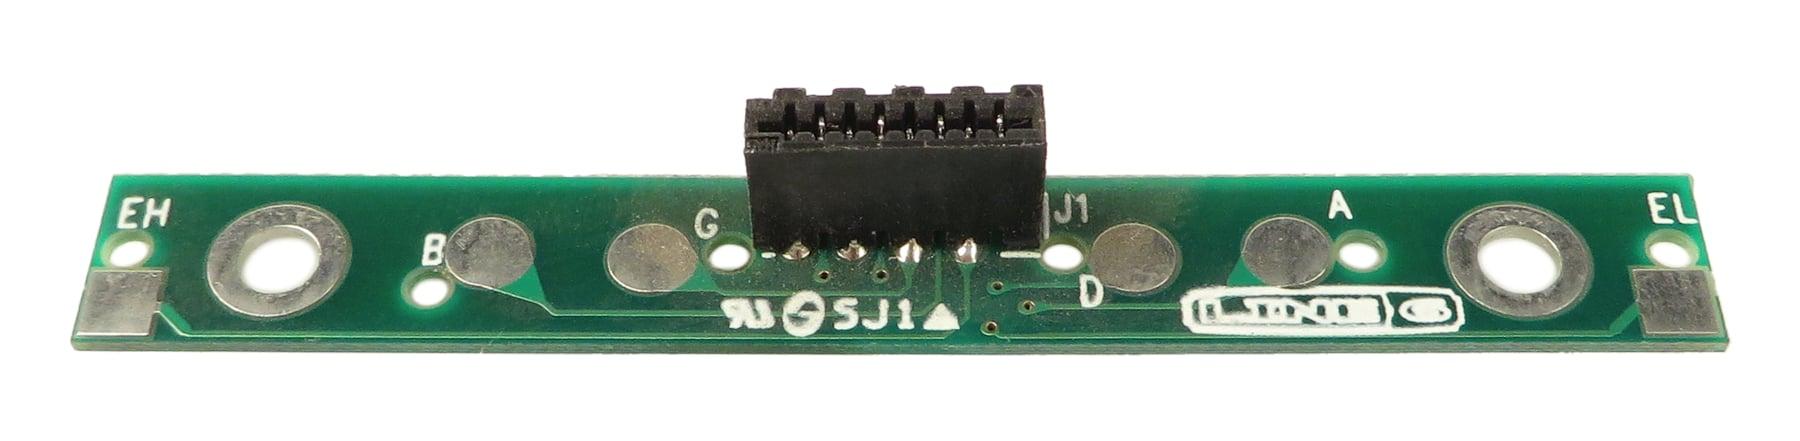 Bridge PCB Assembly for Variax 700